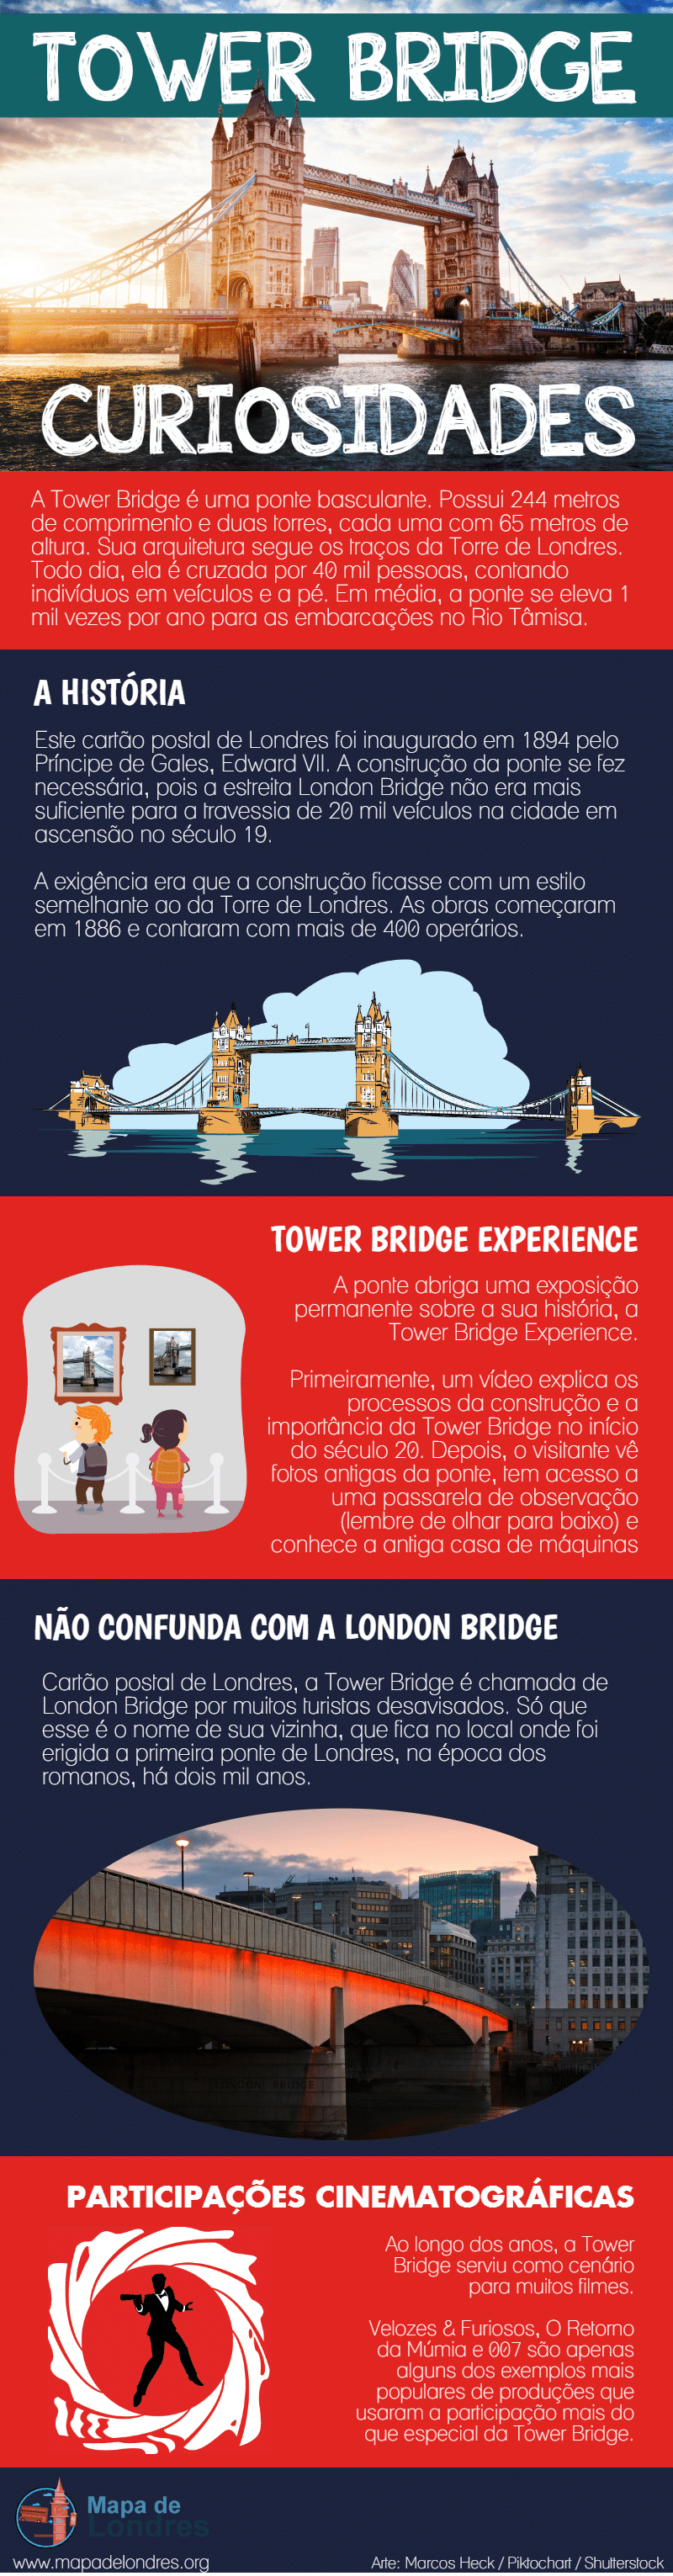 Mapa de Londres - Tower Bridge (4)